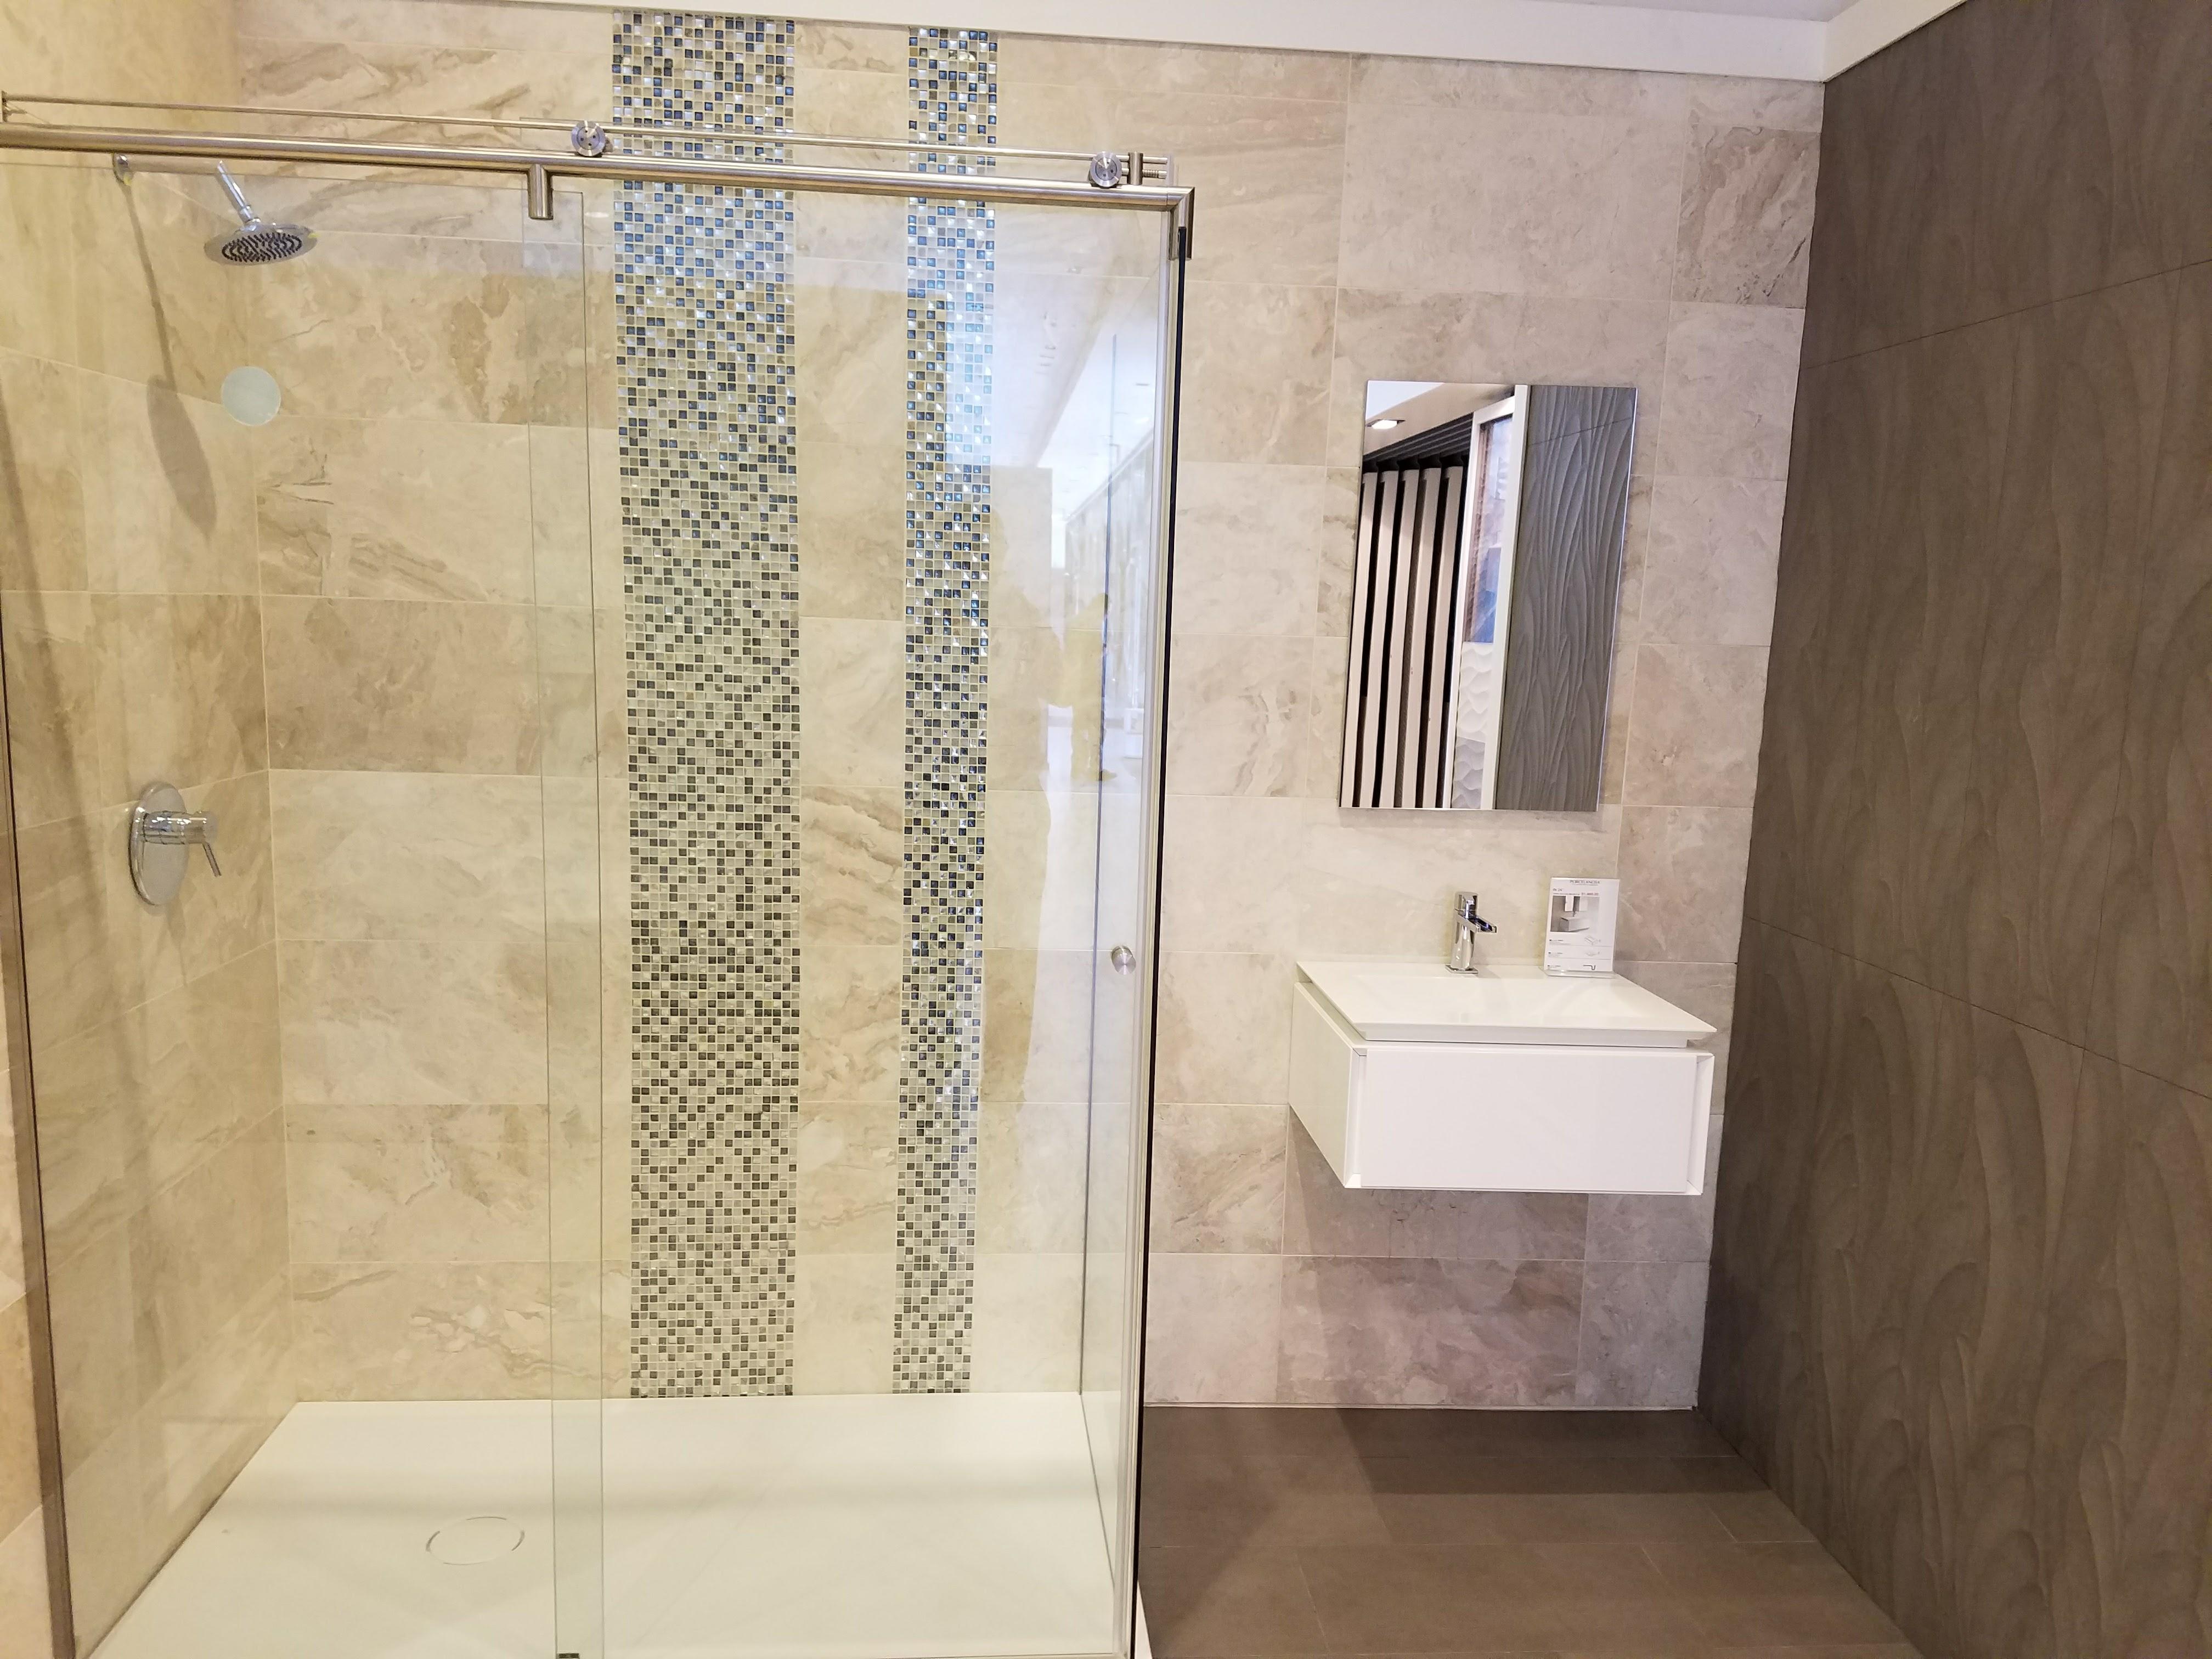 Bathroom Cabinets San Diego Bathroom Remodeling in San Diego